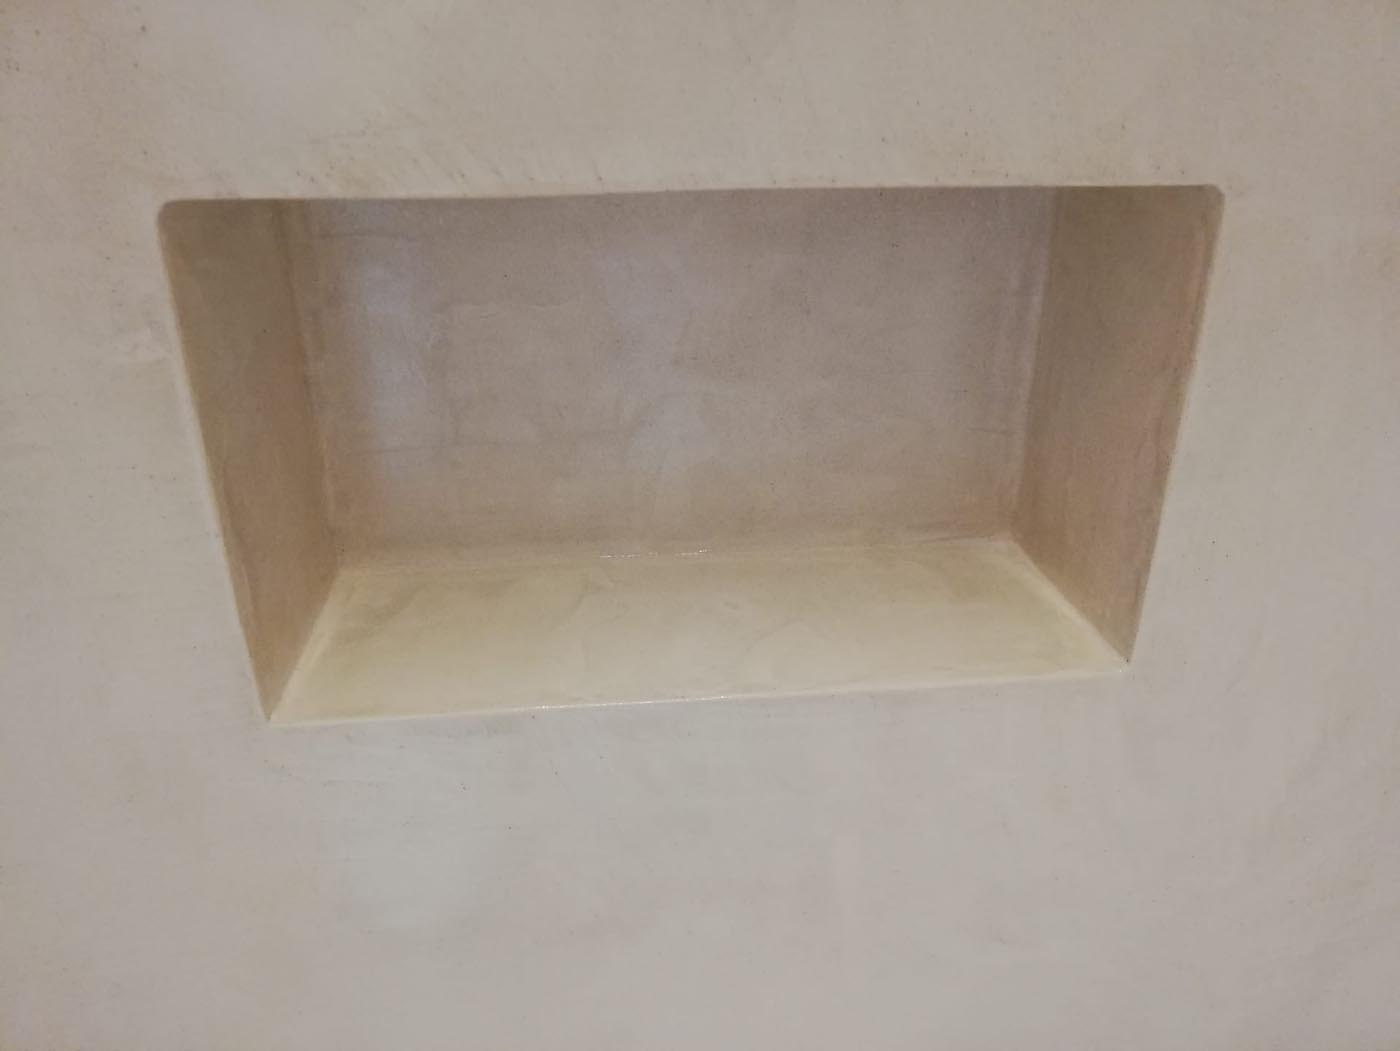 Mortex badkamervloer en wand, inloopdouche, douchenis nieuwbouw Turnhout